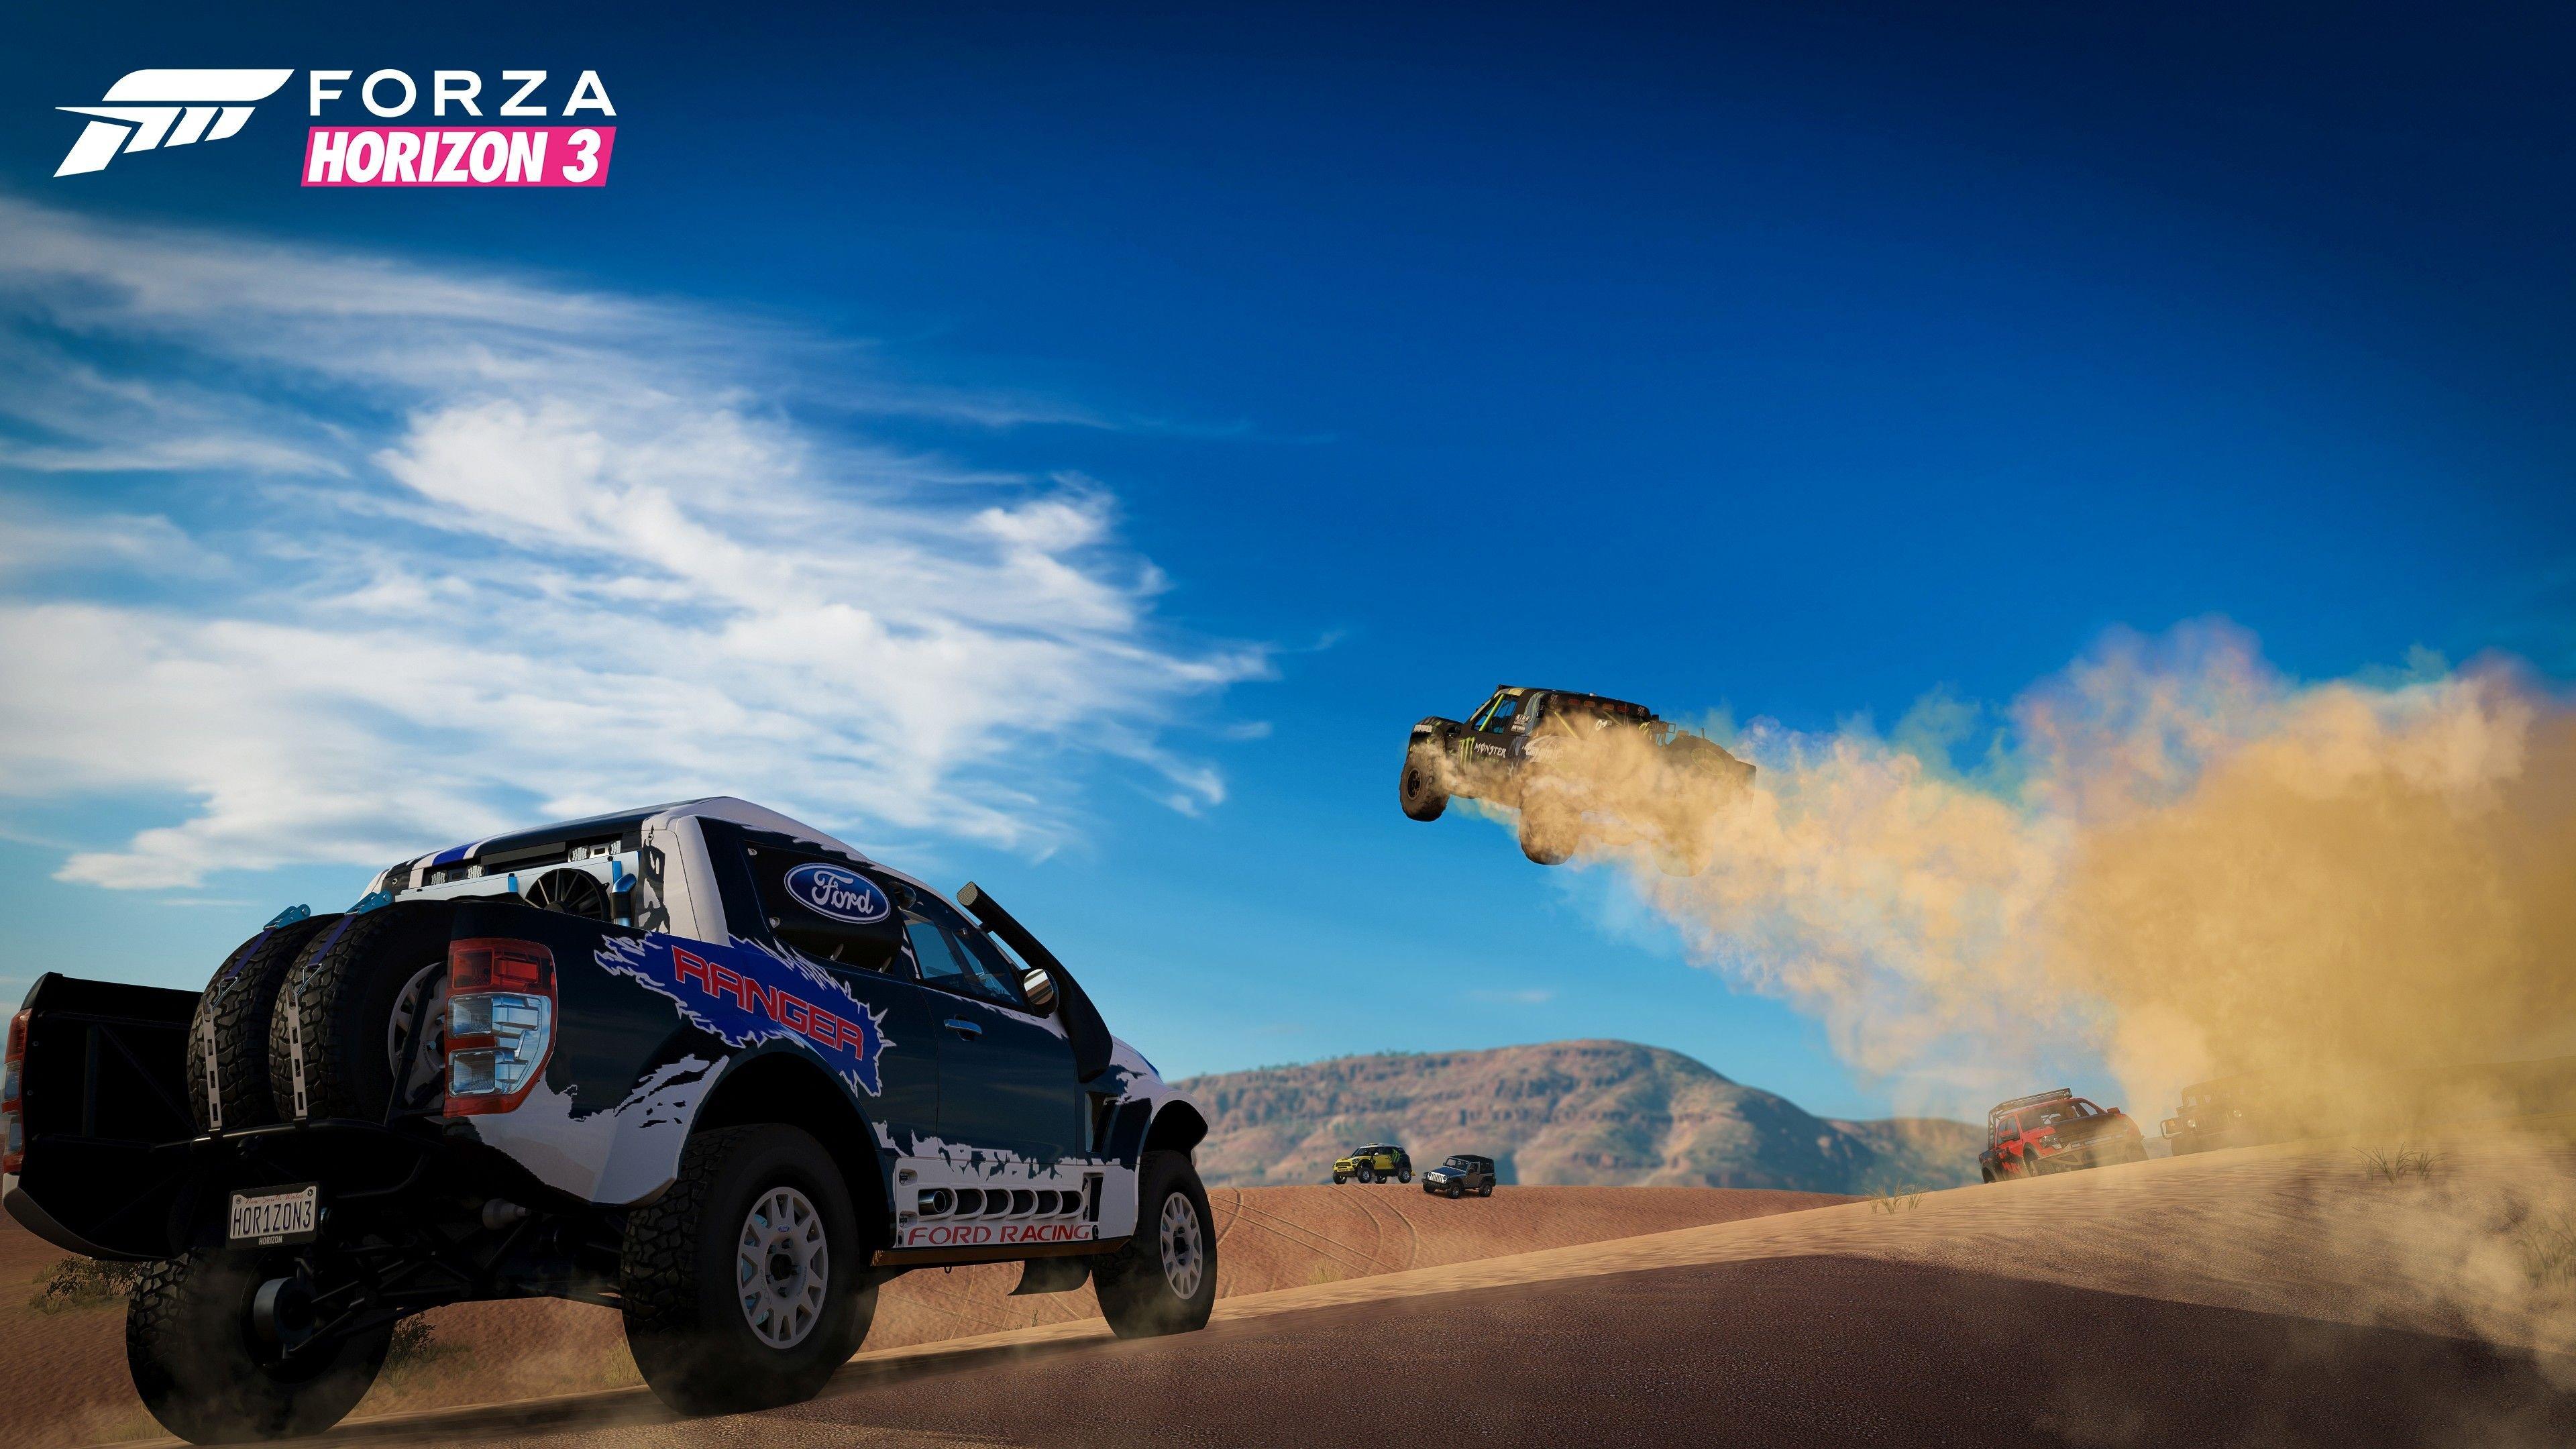 Xbox One Forza Horizon 3 : Imágenes de forza horizon para xbox one djuegos